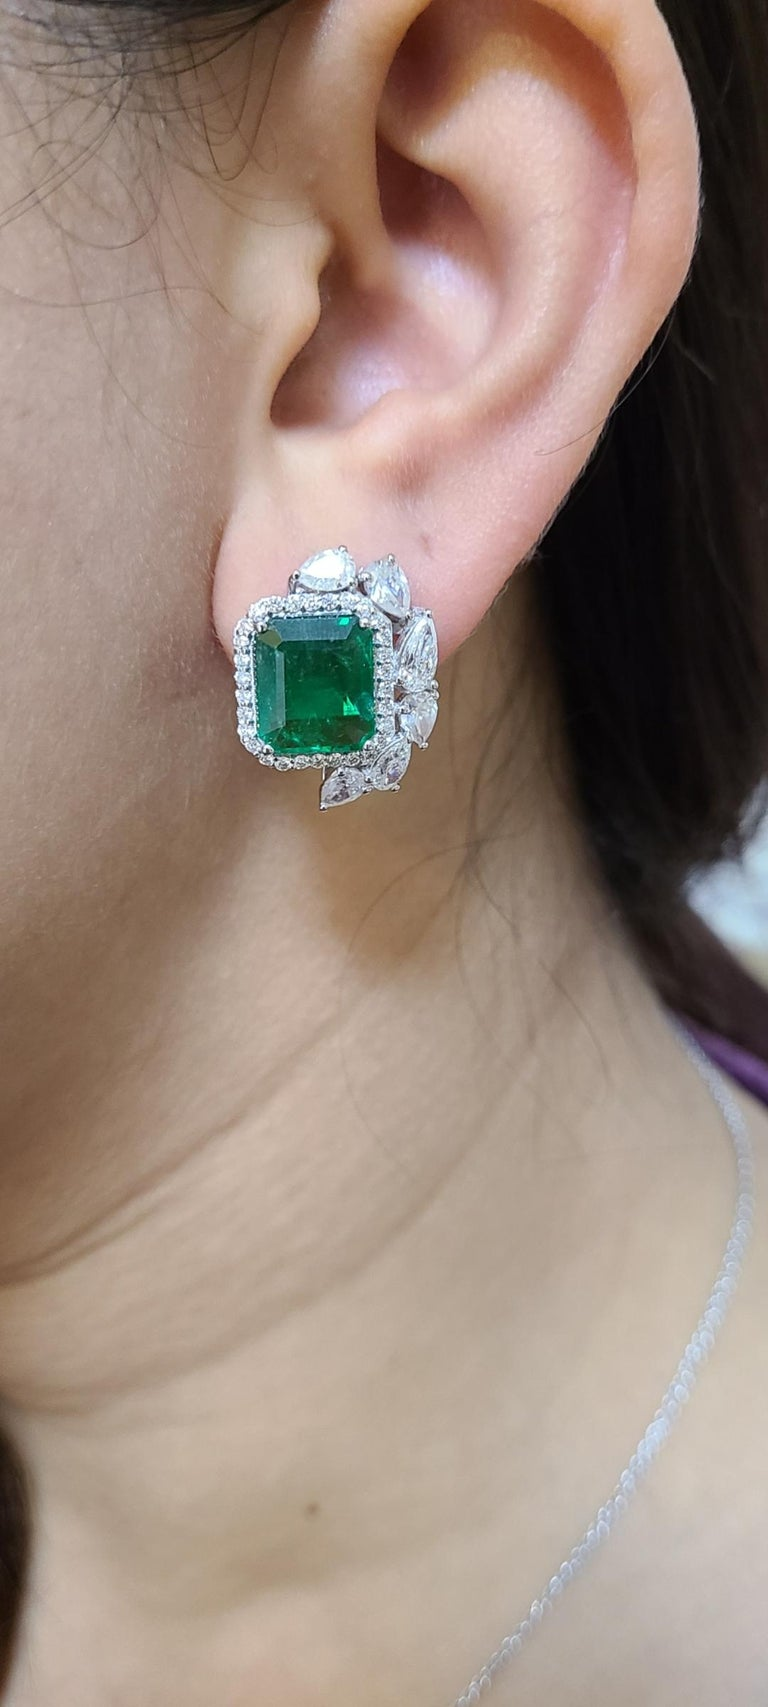 18 Karat White Gold Natural Zambian Emeralds Studs with Diamonds For Sale 1